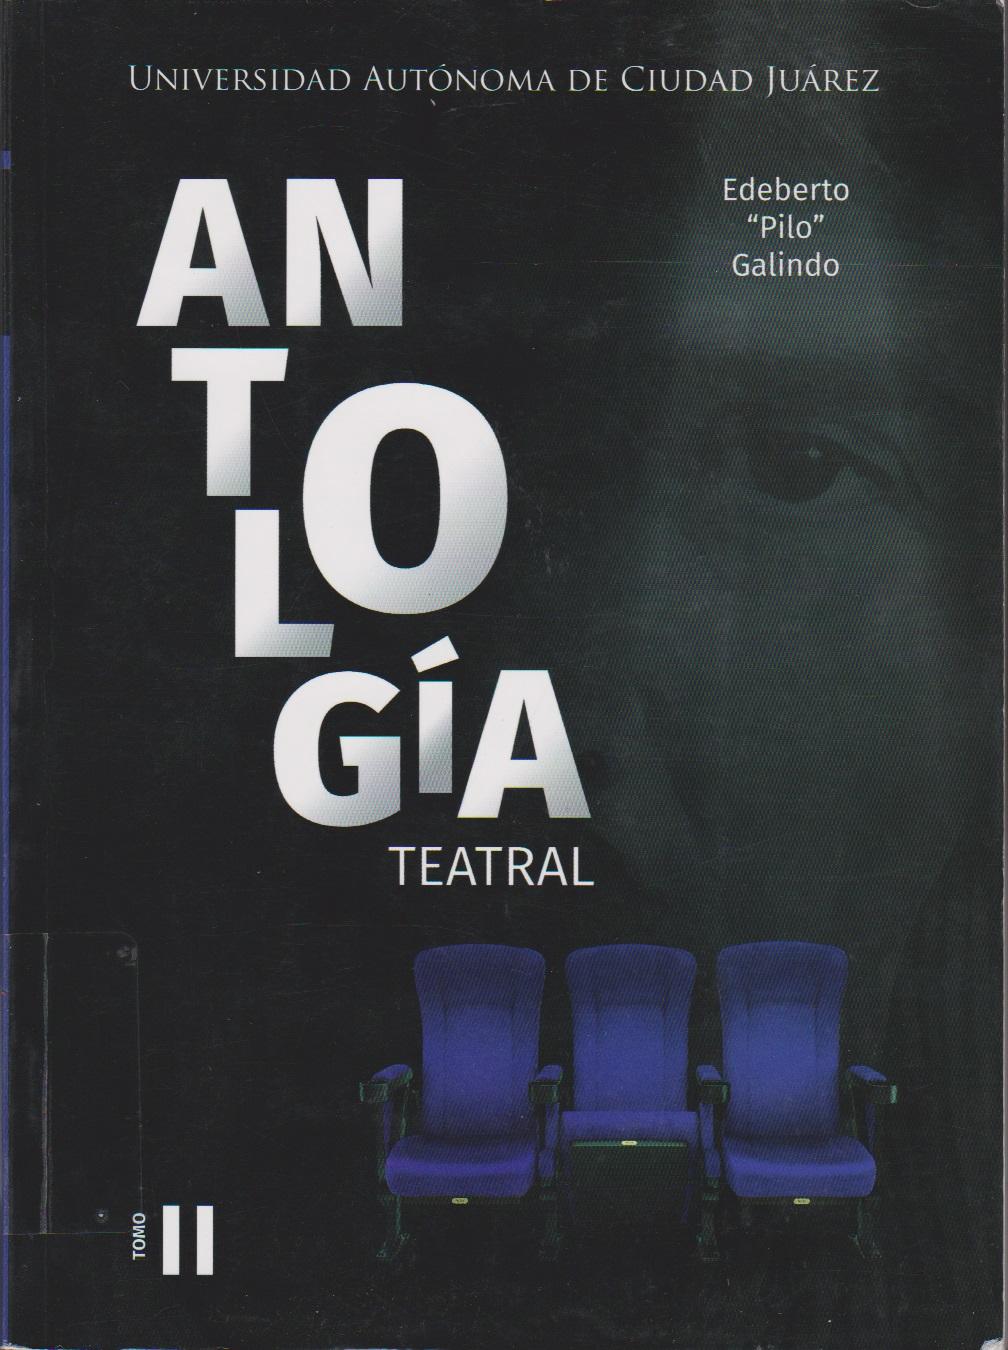 130 Galindo - Antologia teatral2.jpg